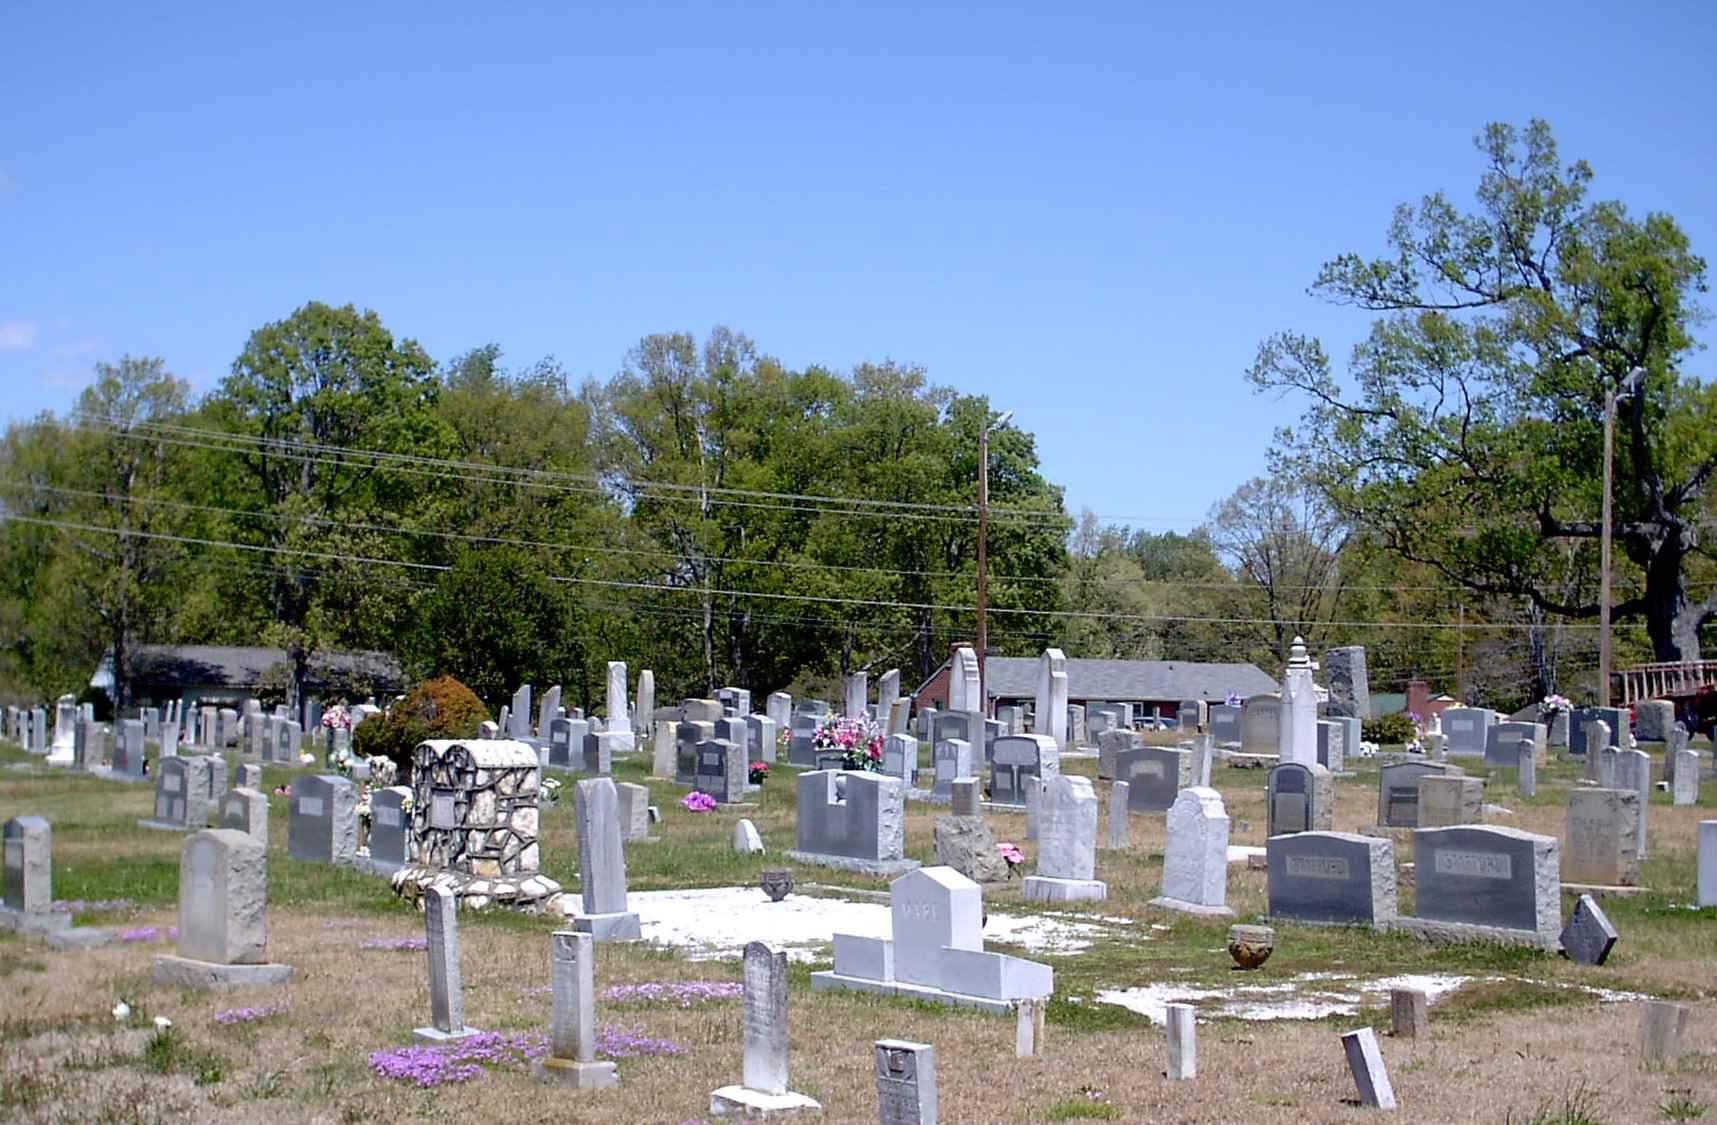 Bunker Hill Community Cemetery